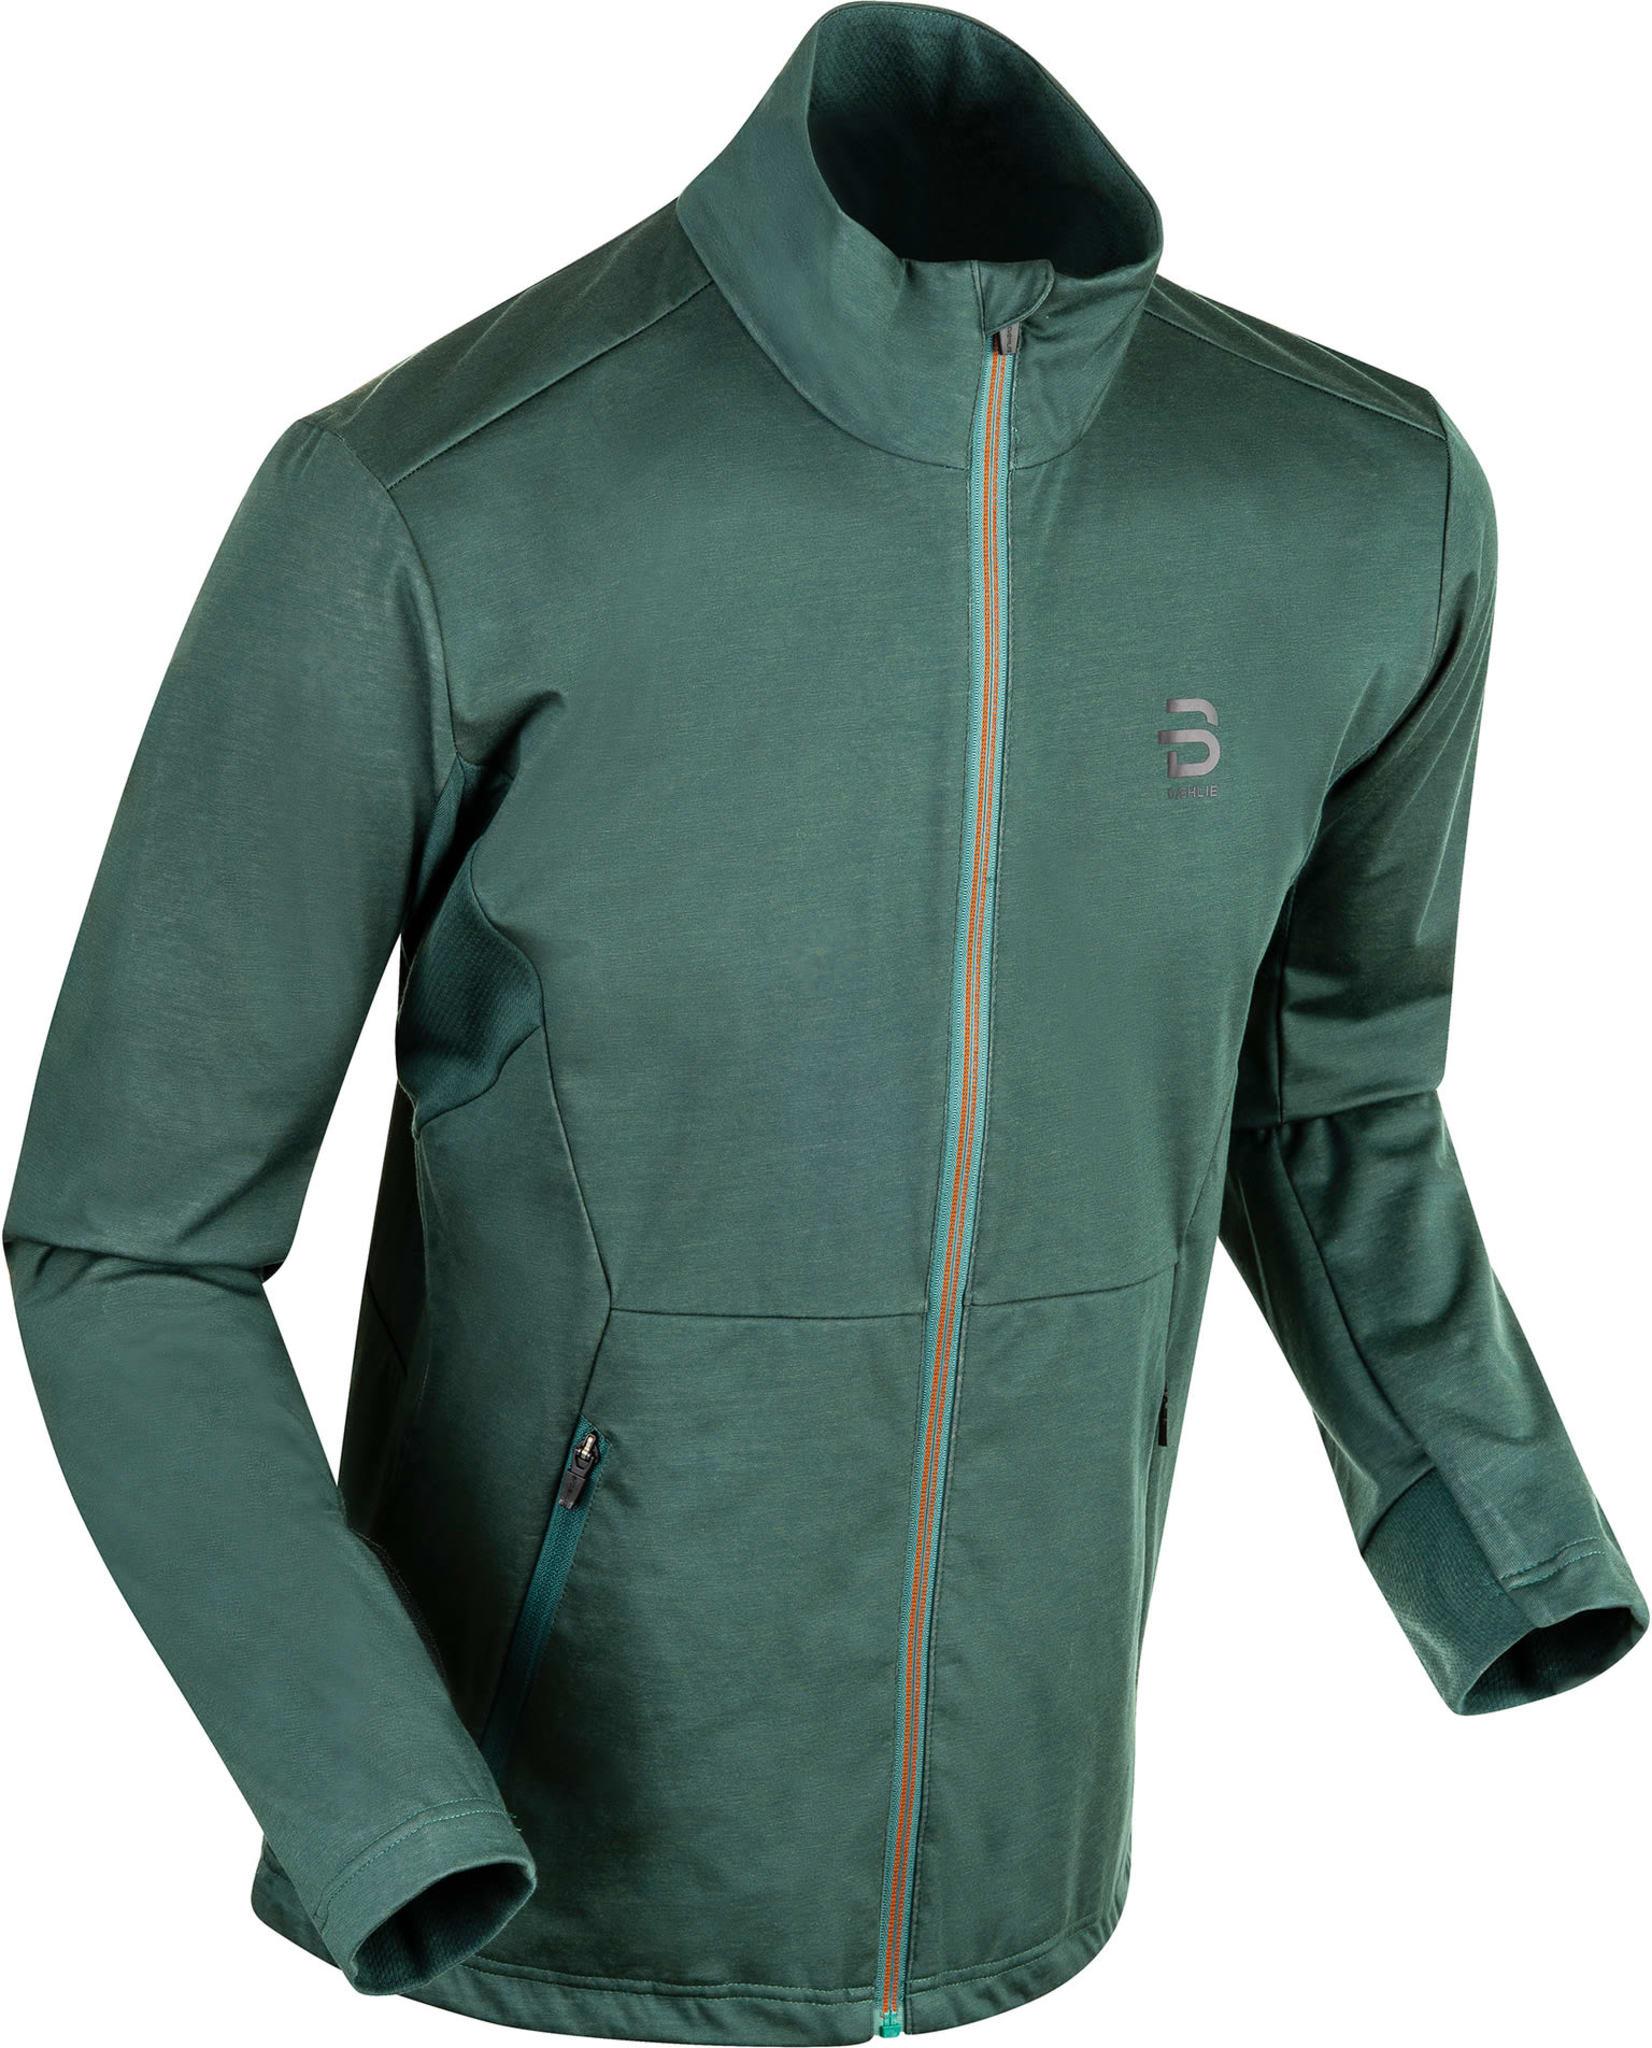 Bærekraftig jakke